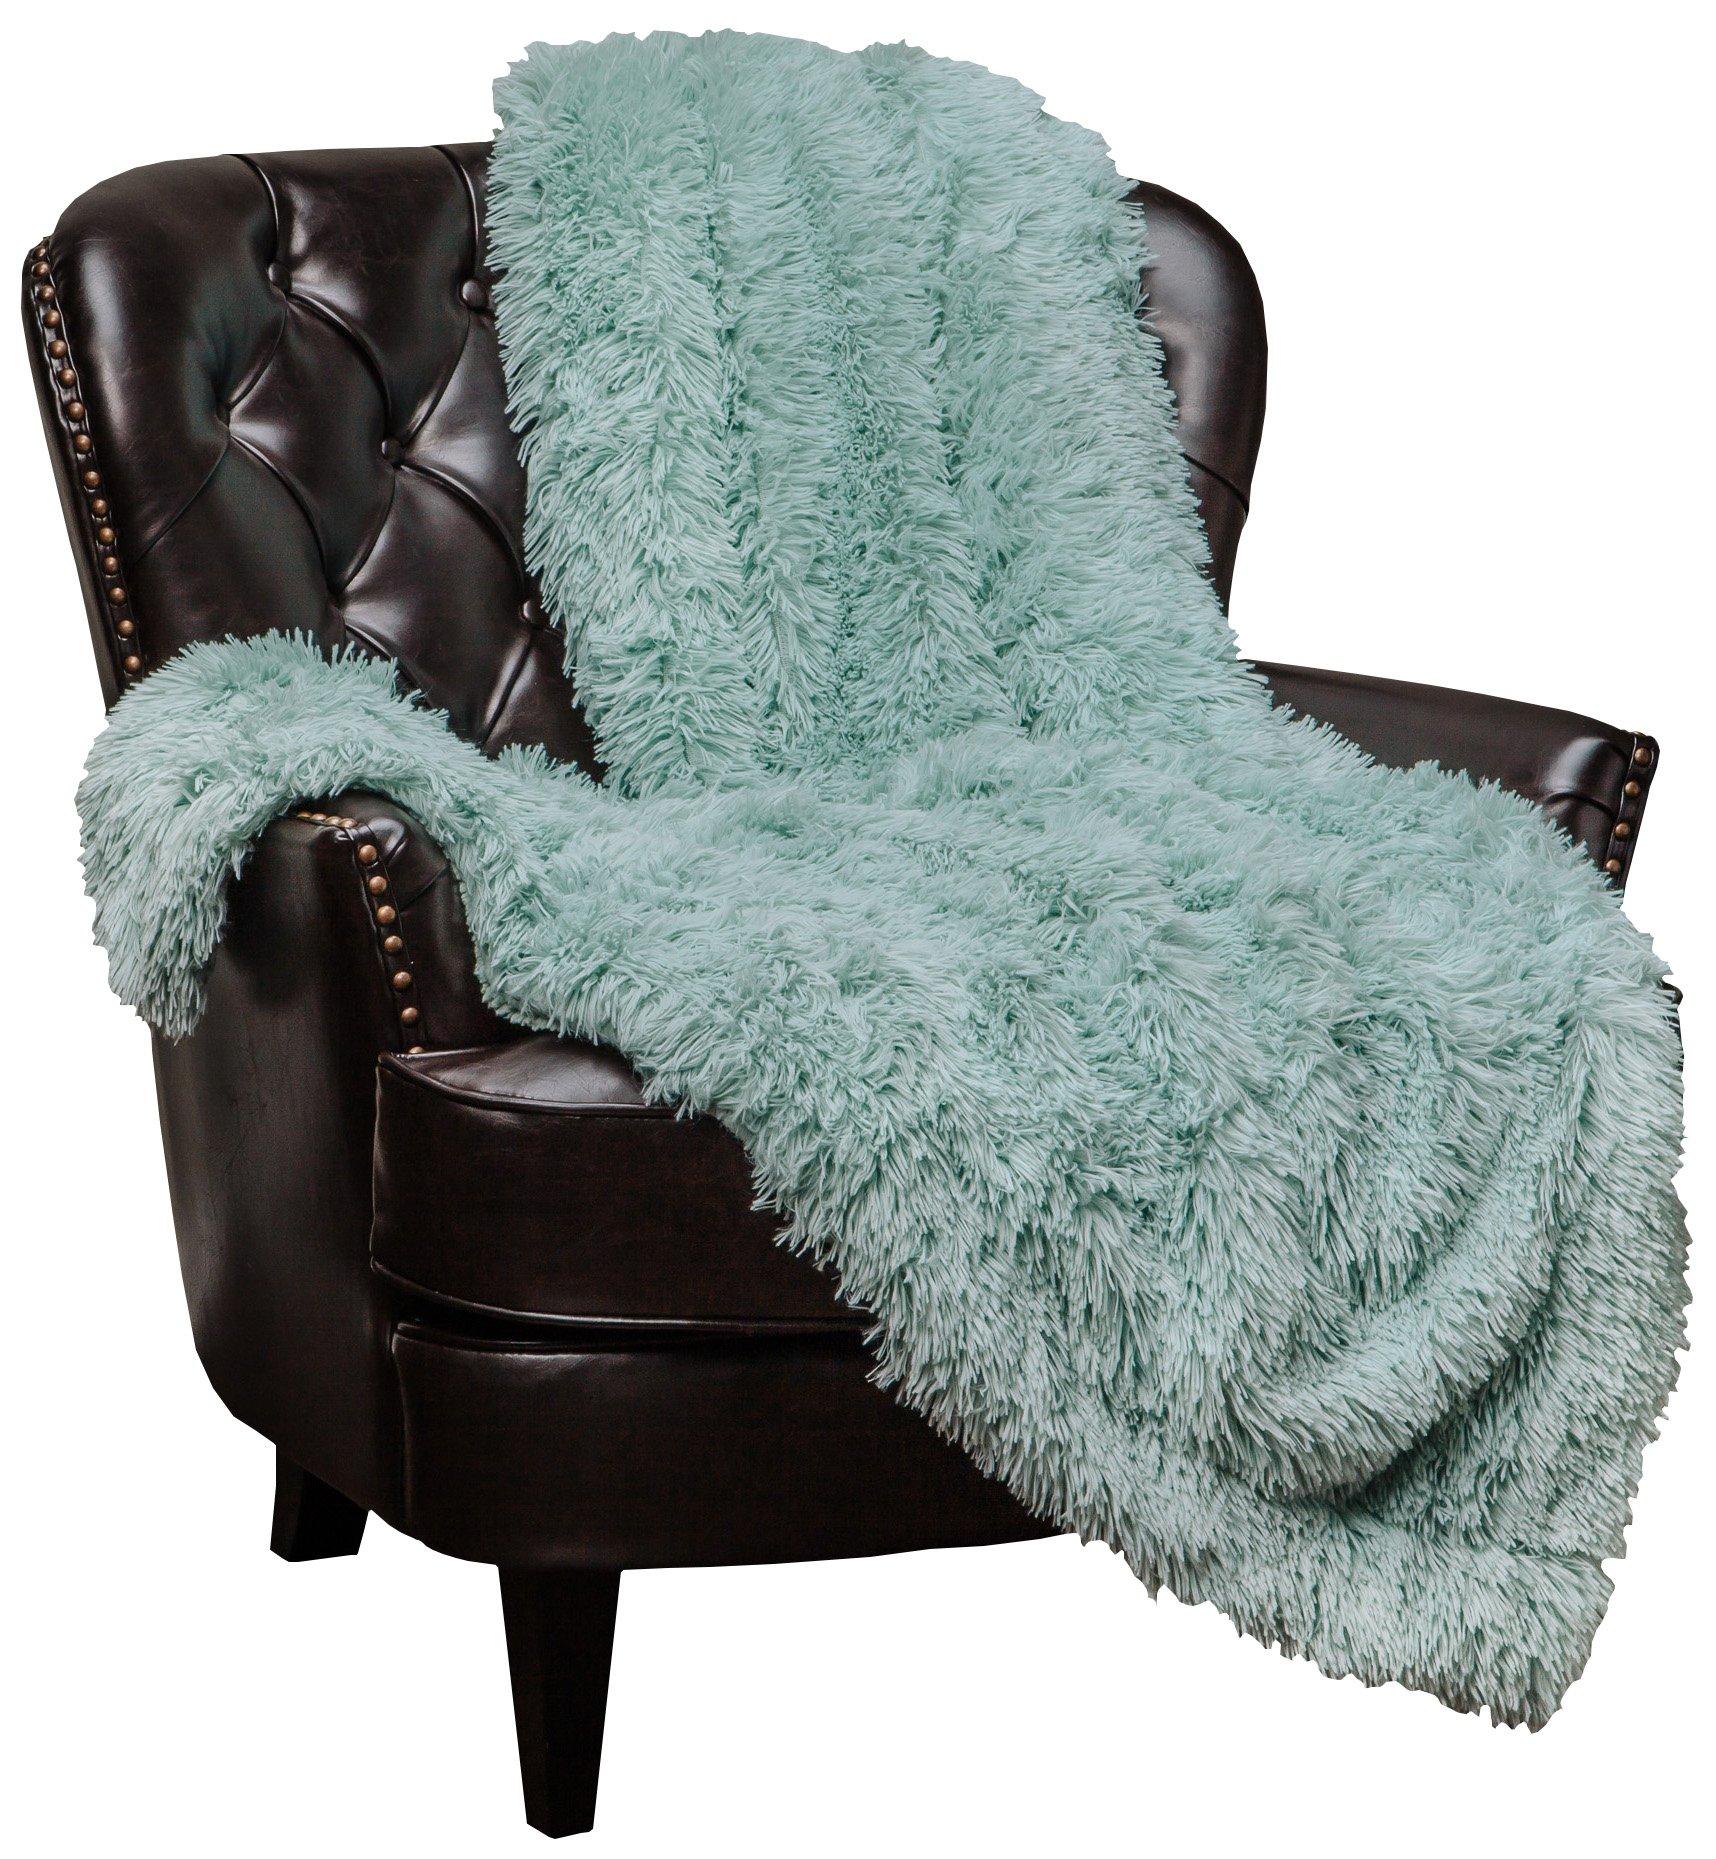 Chanasya Super Soft Shaggy Longfur Throw Blanket | Snuggly Fuzzy Faux Fur Lightweight Warm Elegant Cozy Plush Sherpa Microfiber Blanket | for Couch Bed Chair Photo Props - 60''x 70'' - Aqua Turquoise